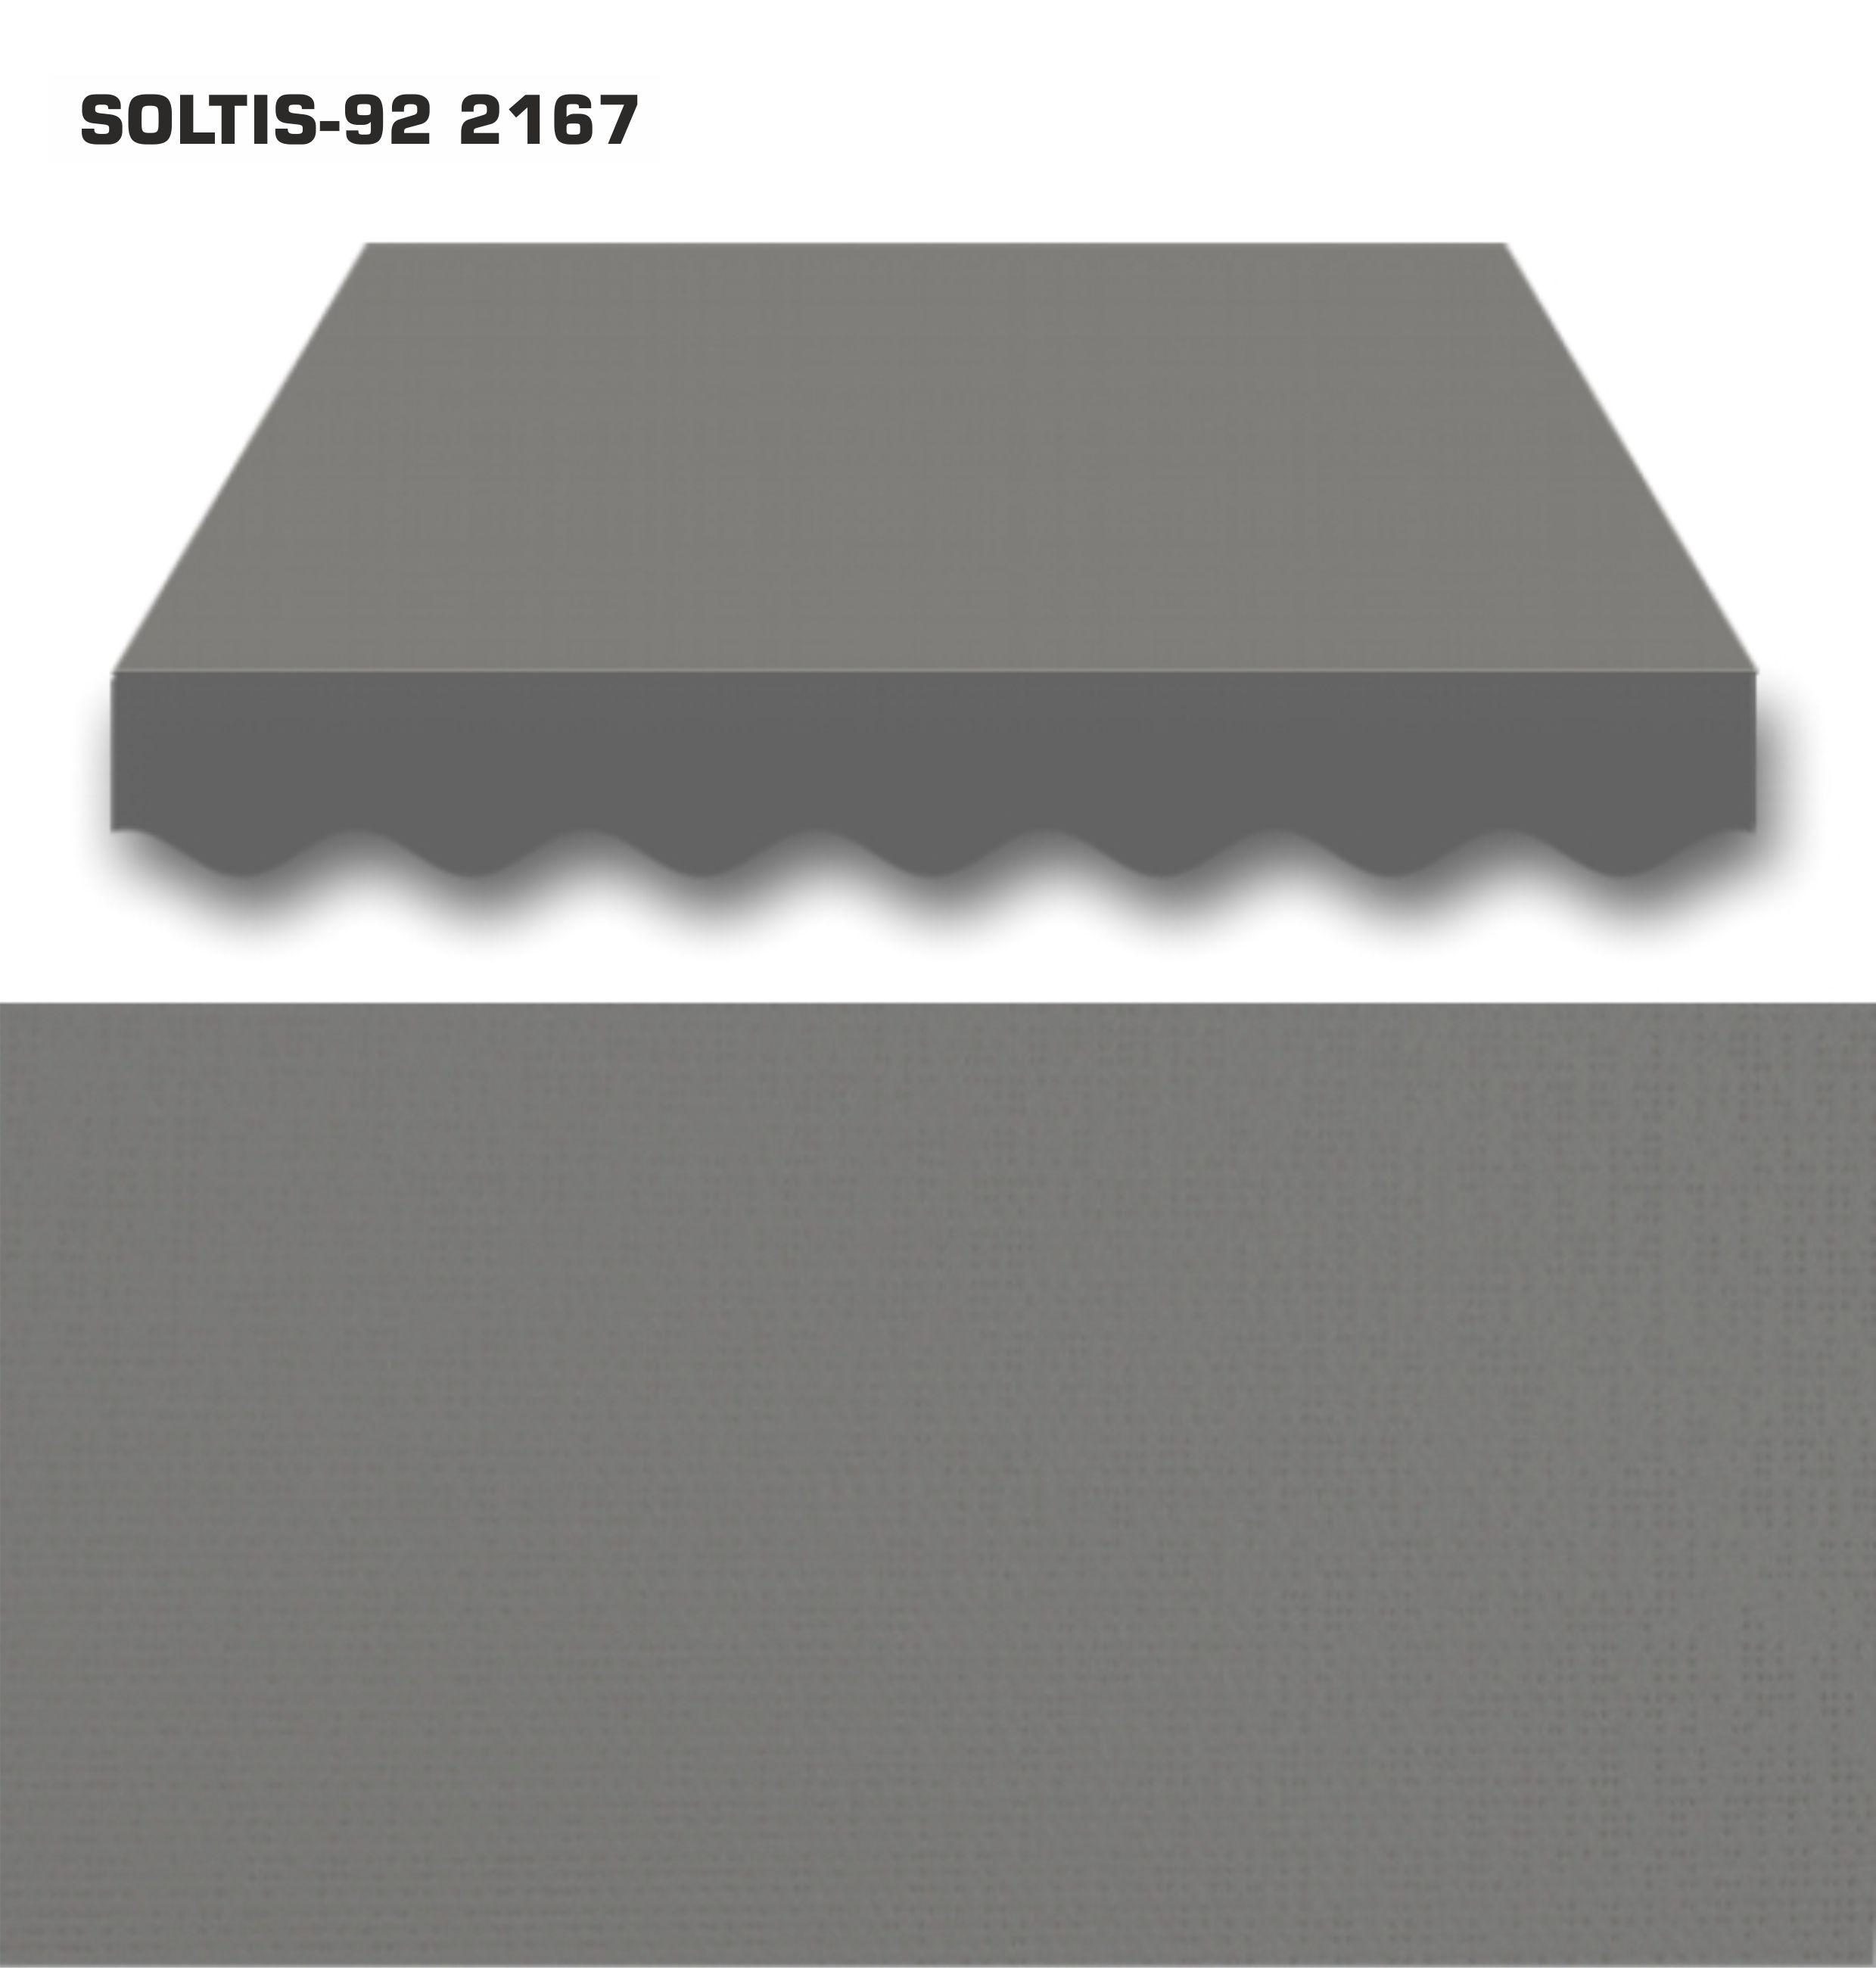 Soltis-92 2167